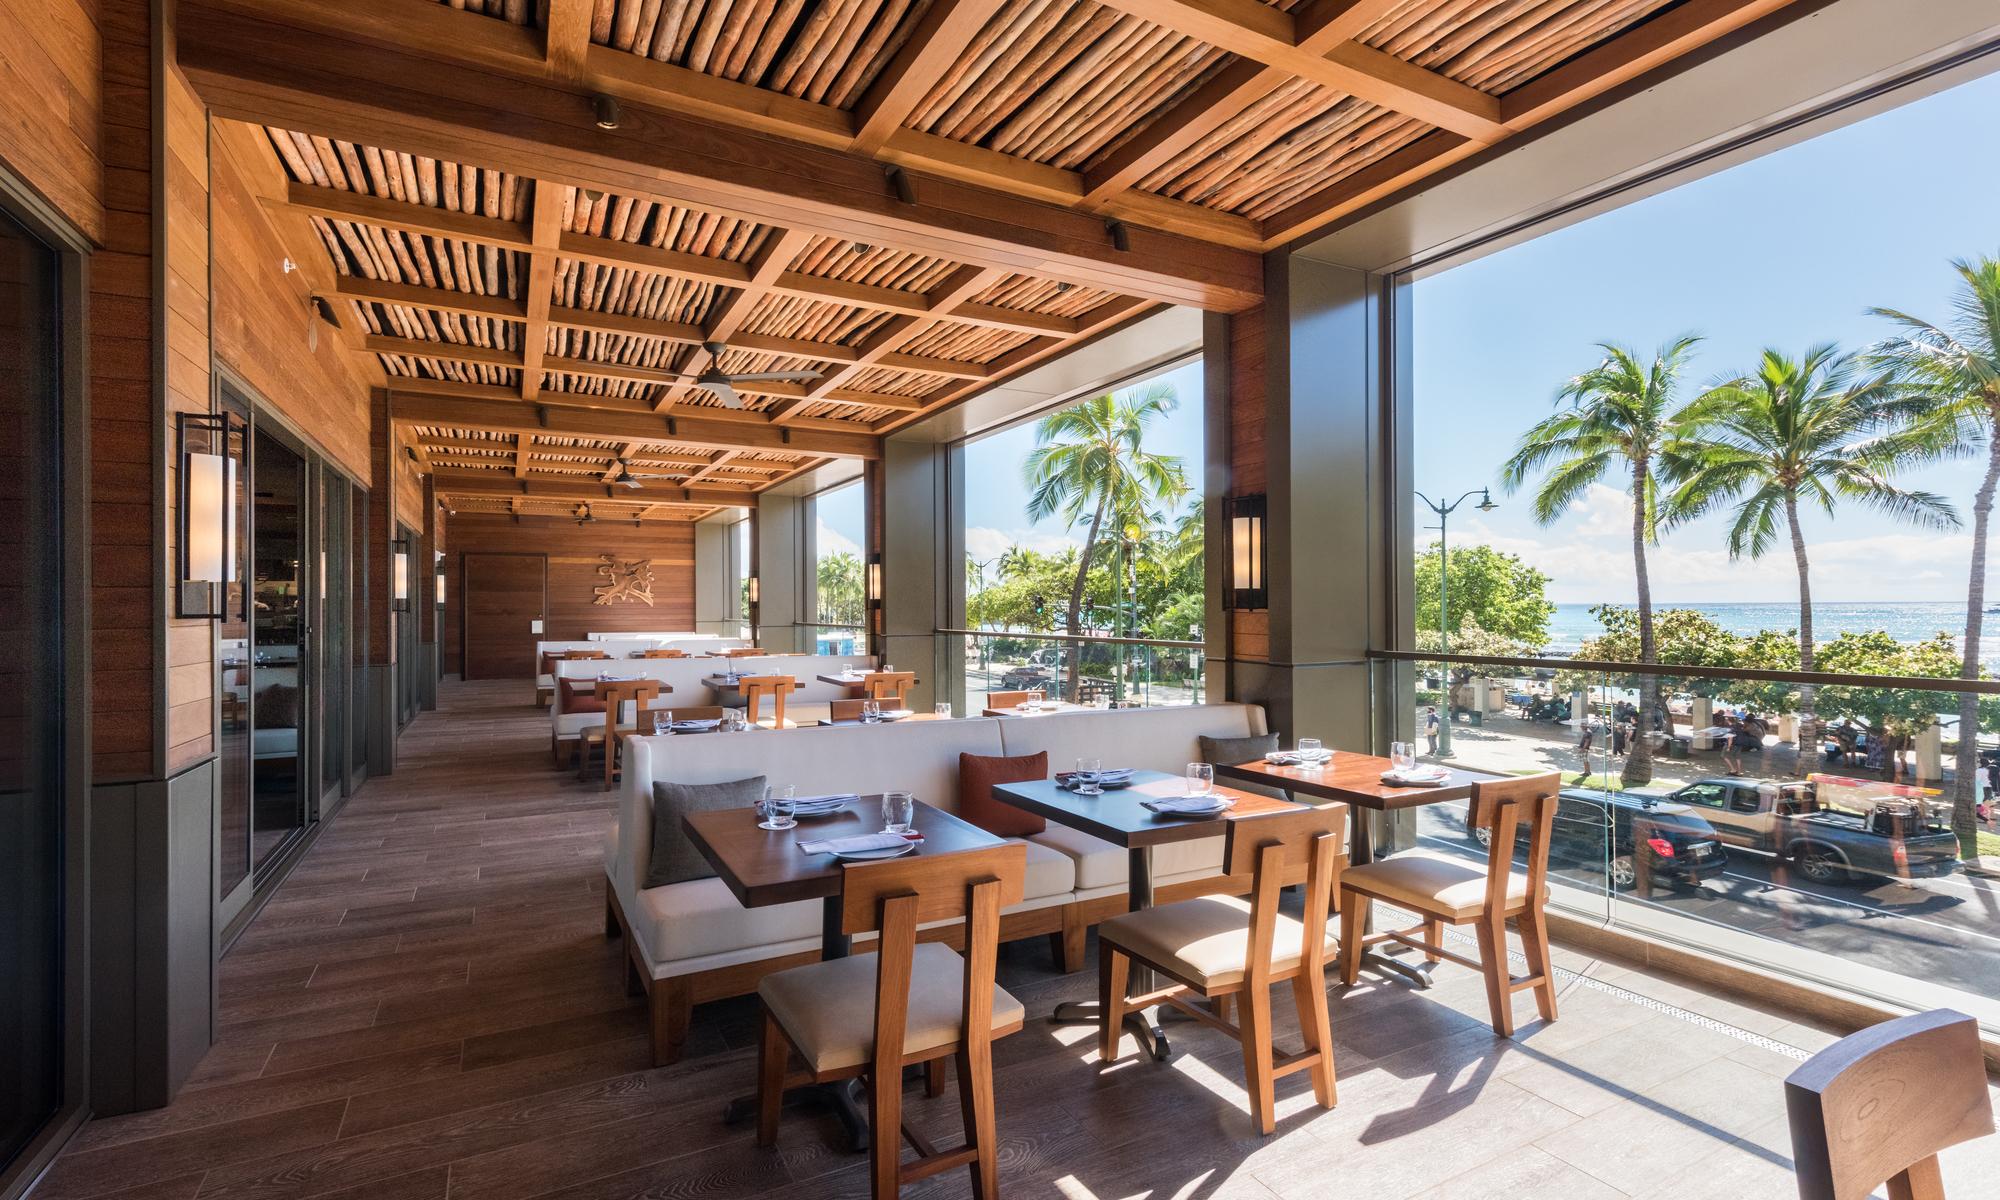 Alohilani Resort Waikiki Beach Morimoto Asia Restaurant - Architecture